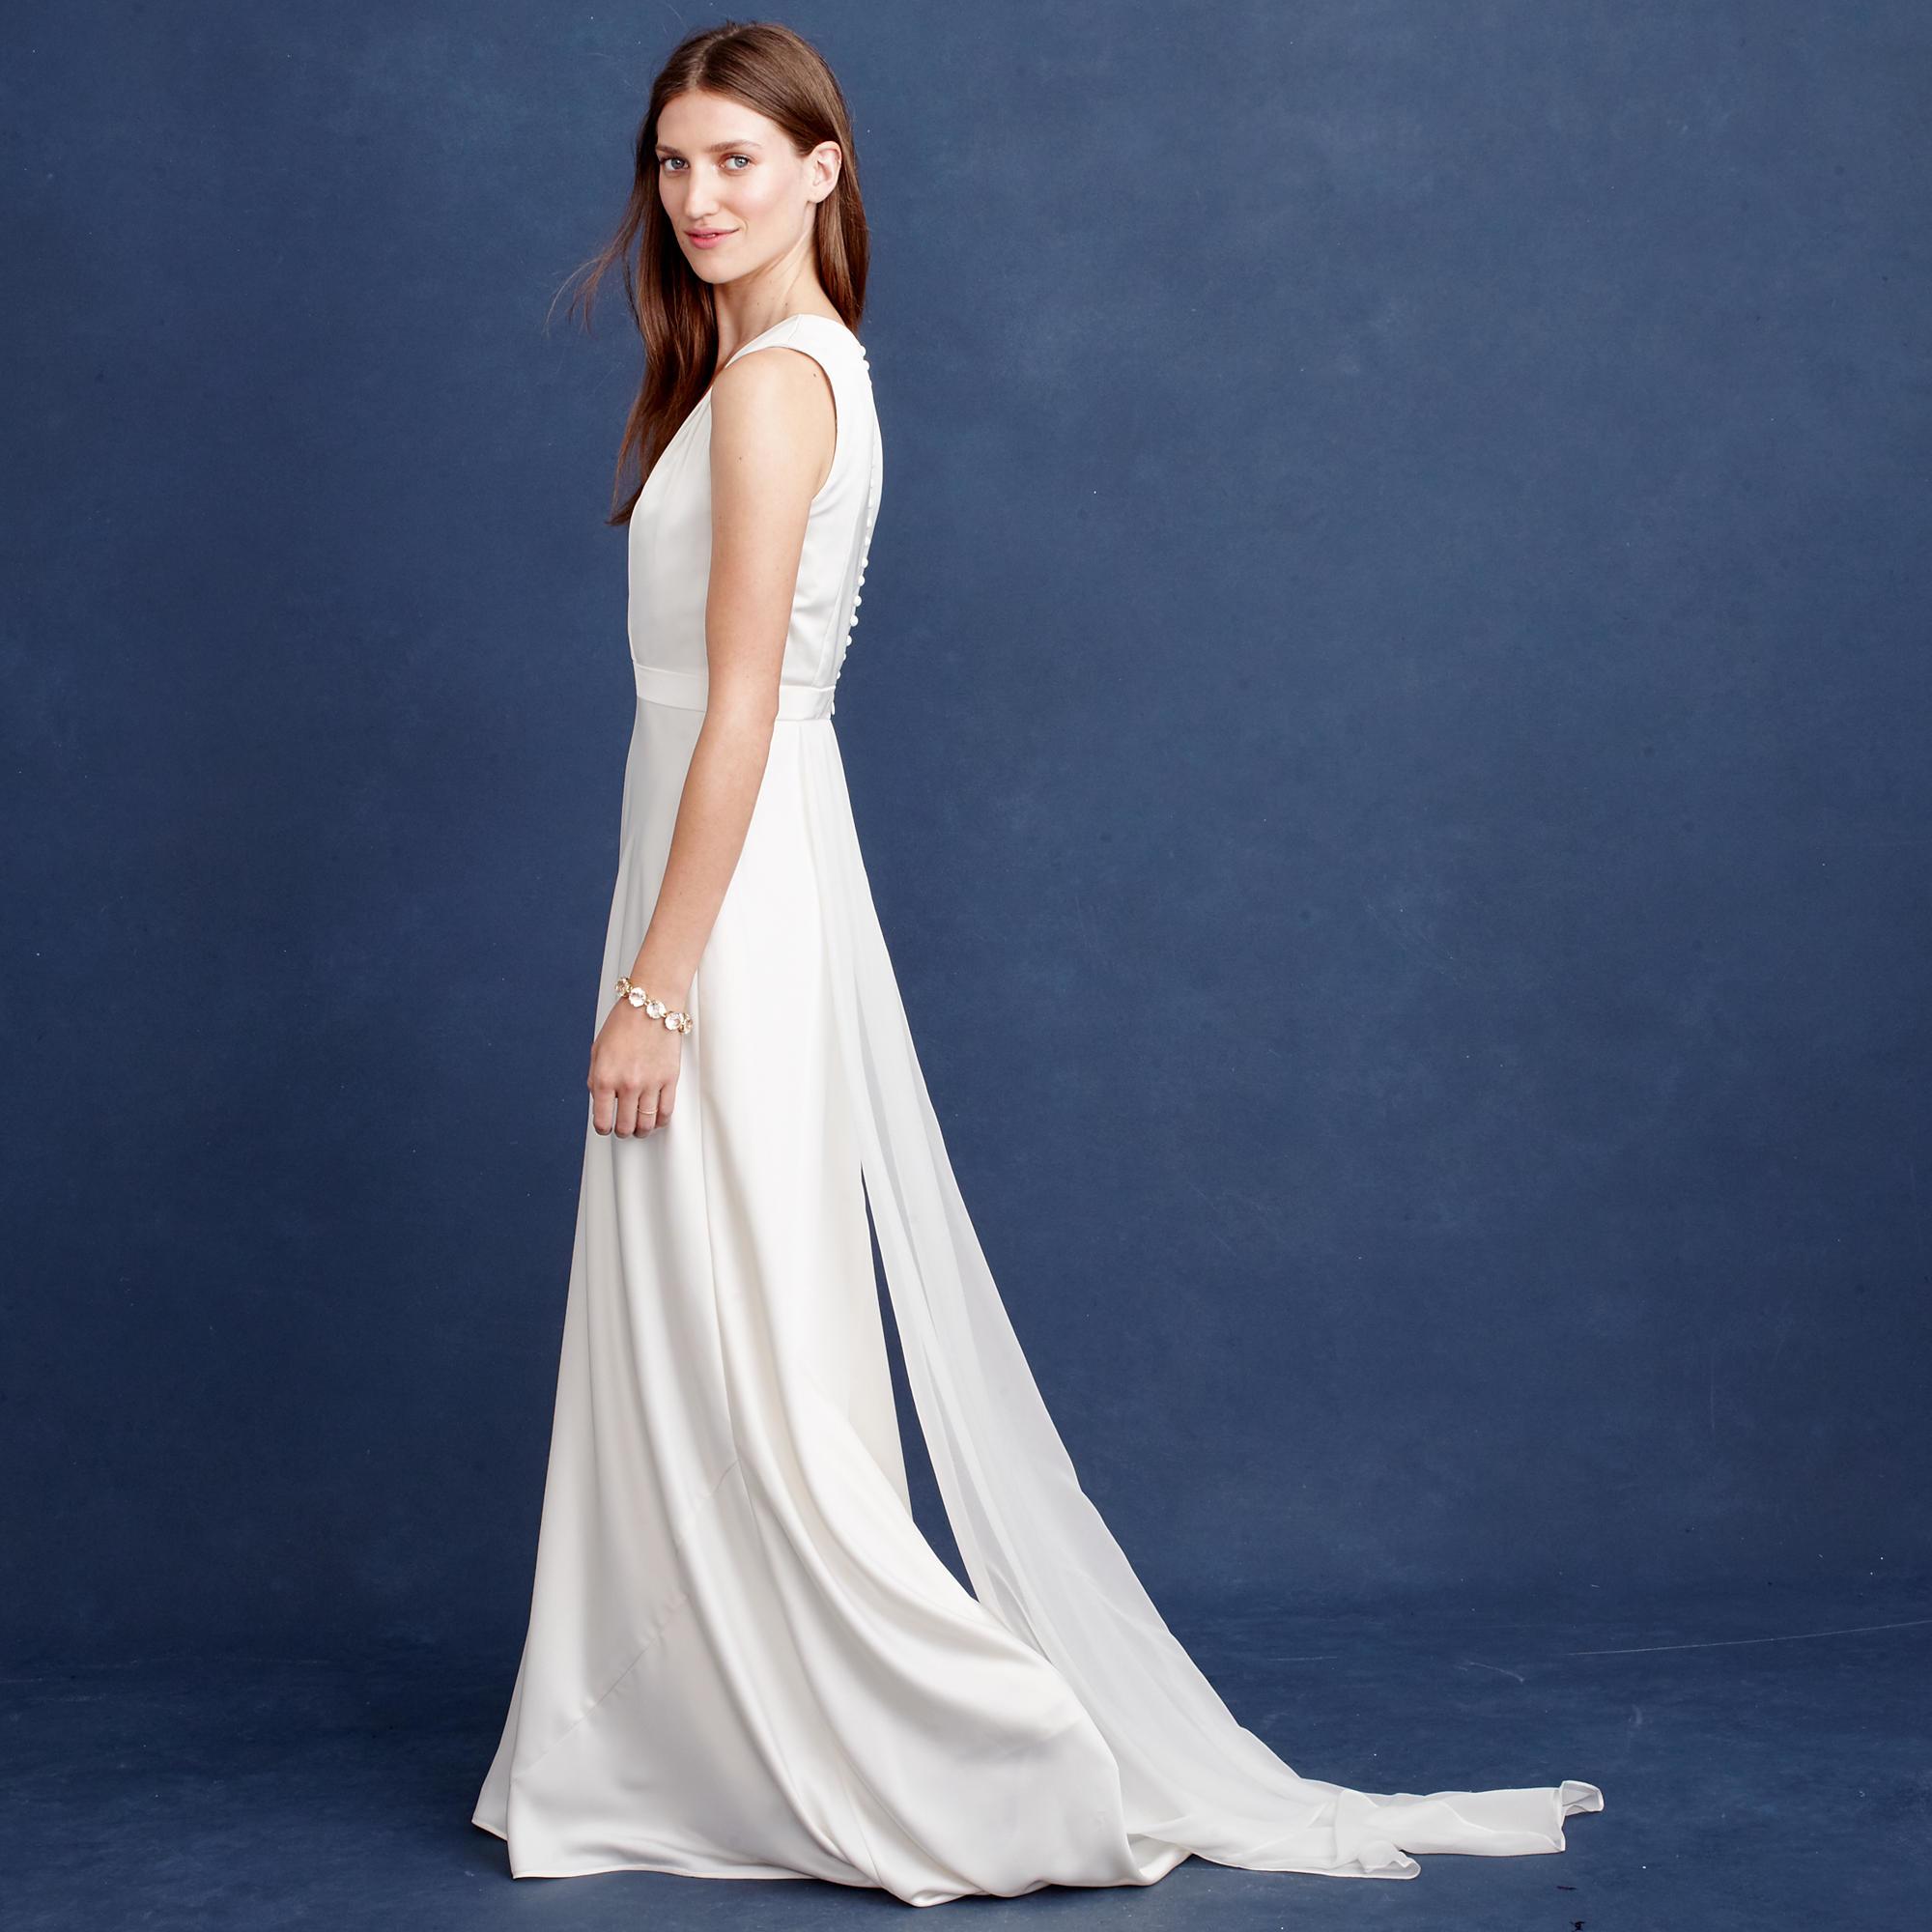 Lyst - J.Crew Lana Gown in White